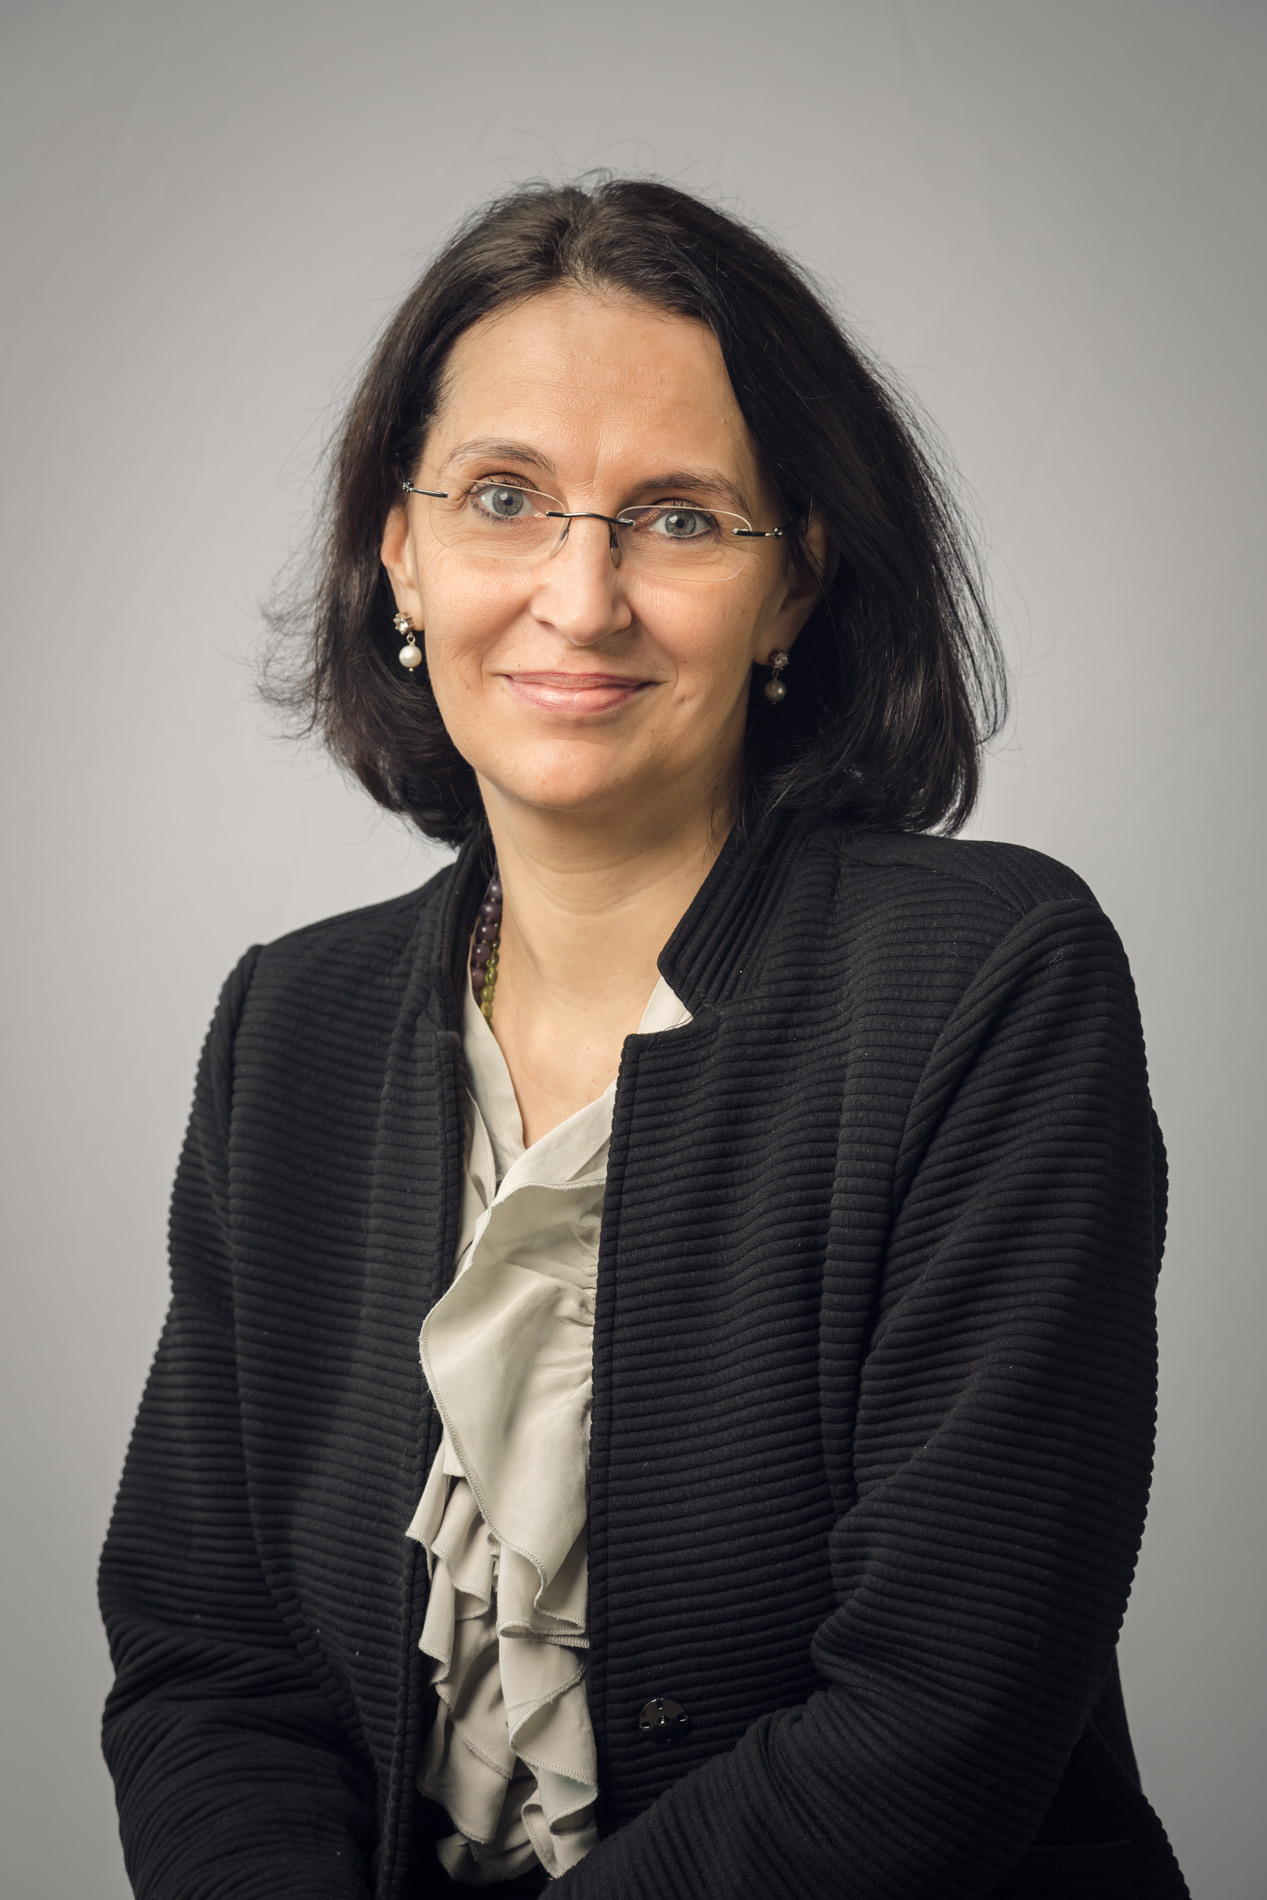 Heide Kreitl